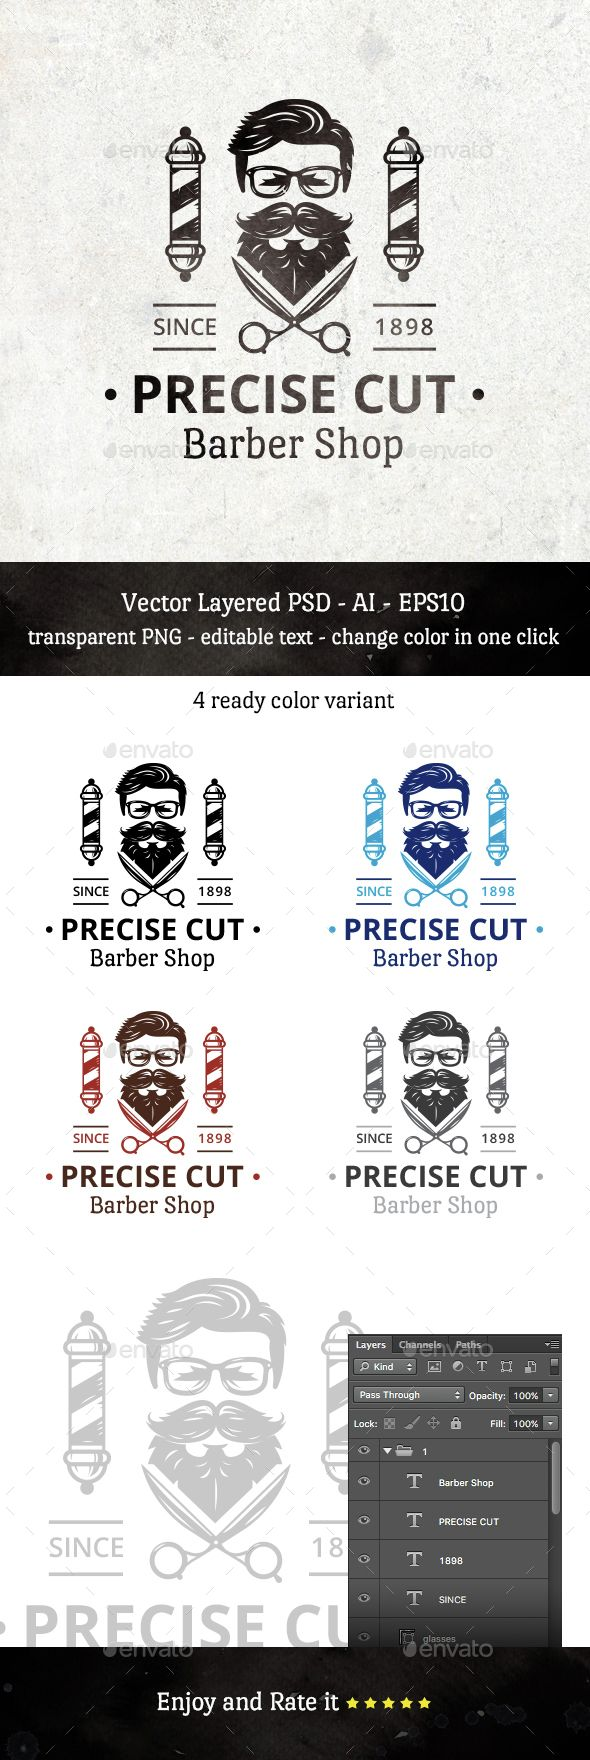 Precise Cut Barber Shop | Friseur, Grafik design und Grafiken